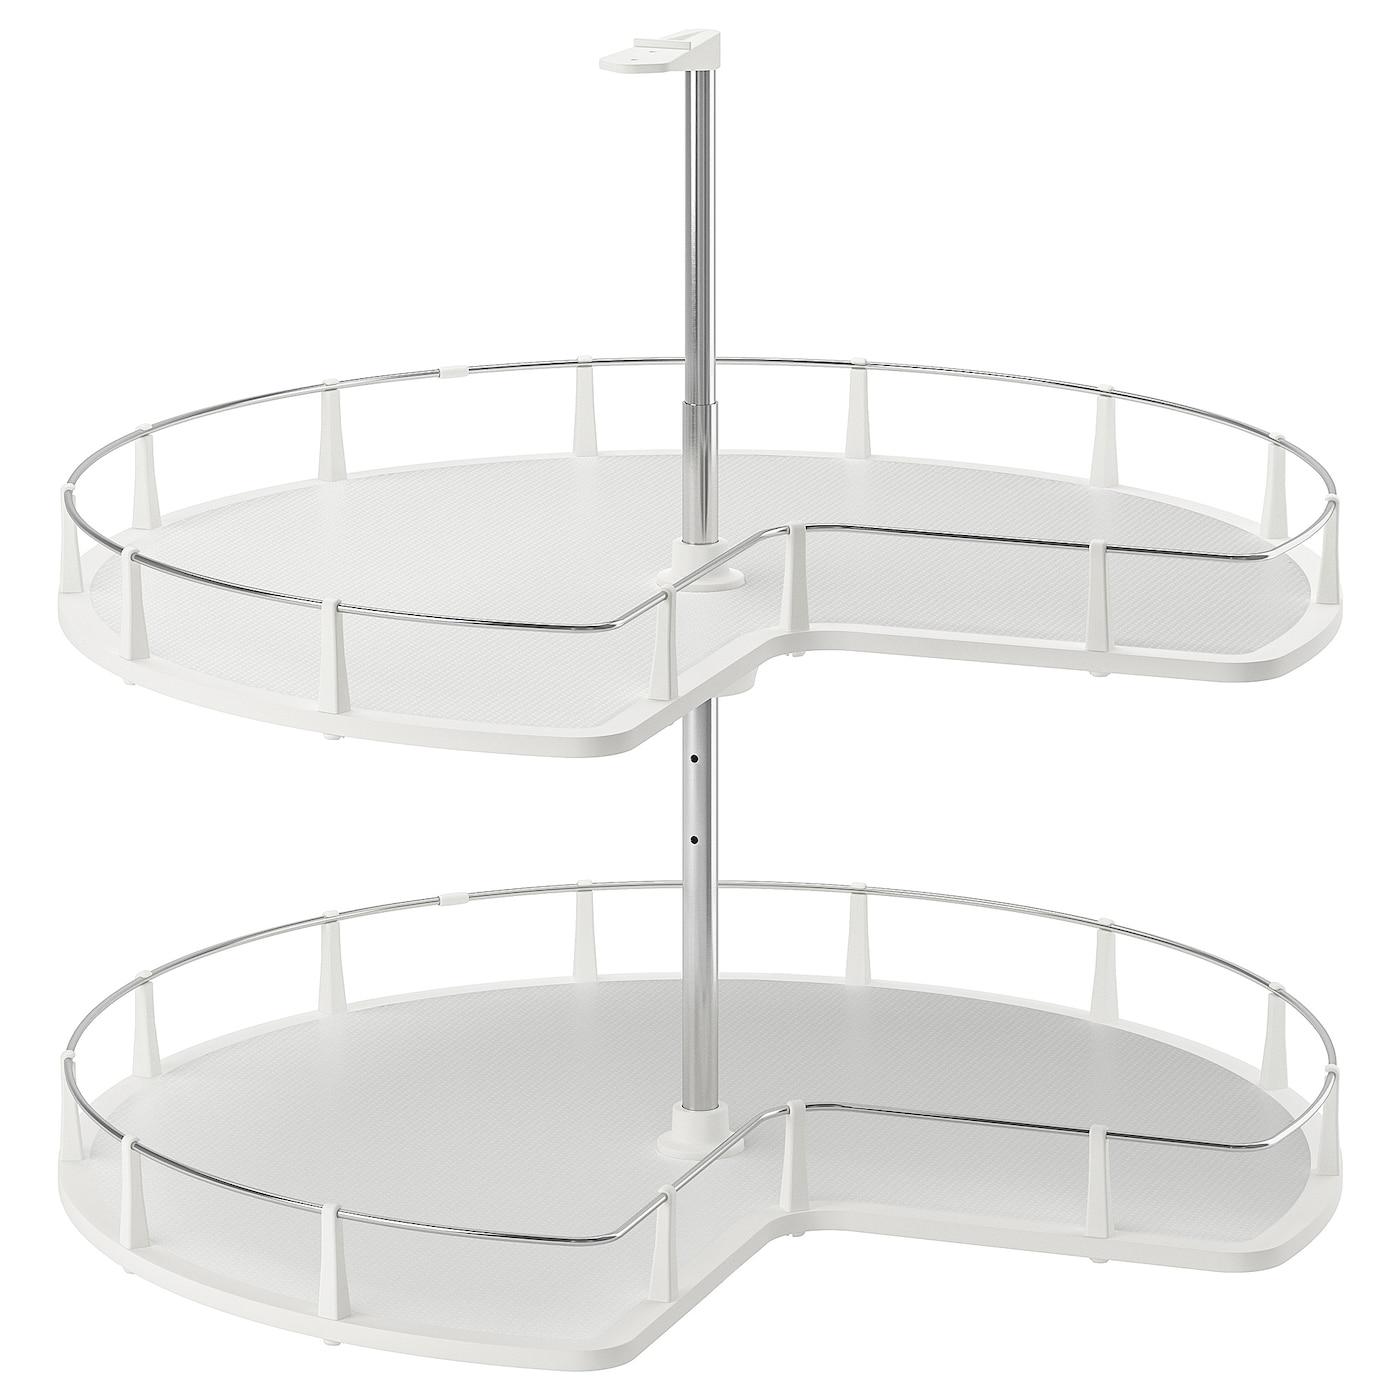 Utrusta Carrousel Onderhoekkast Ikea